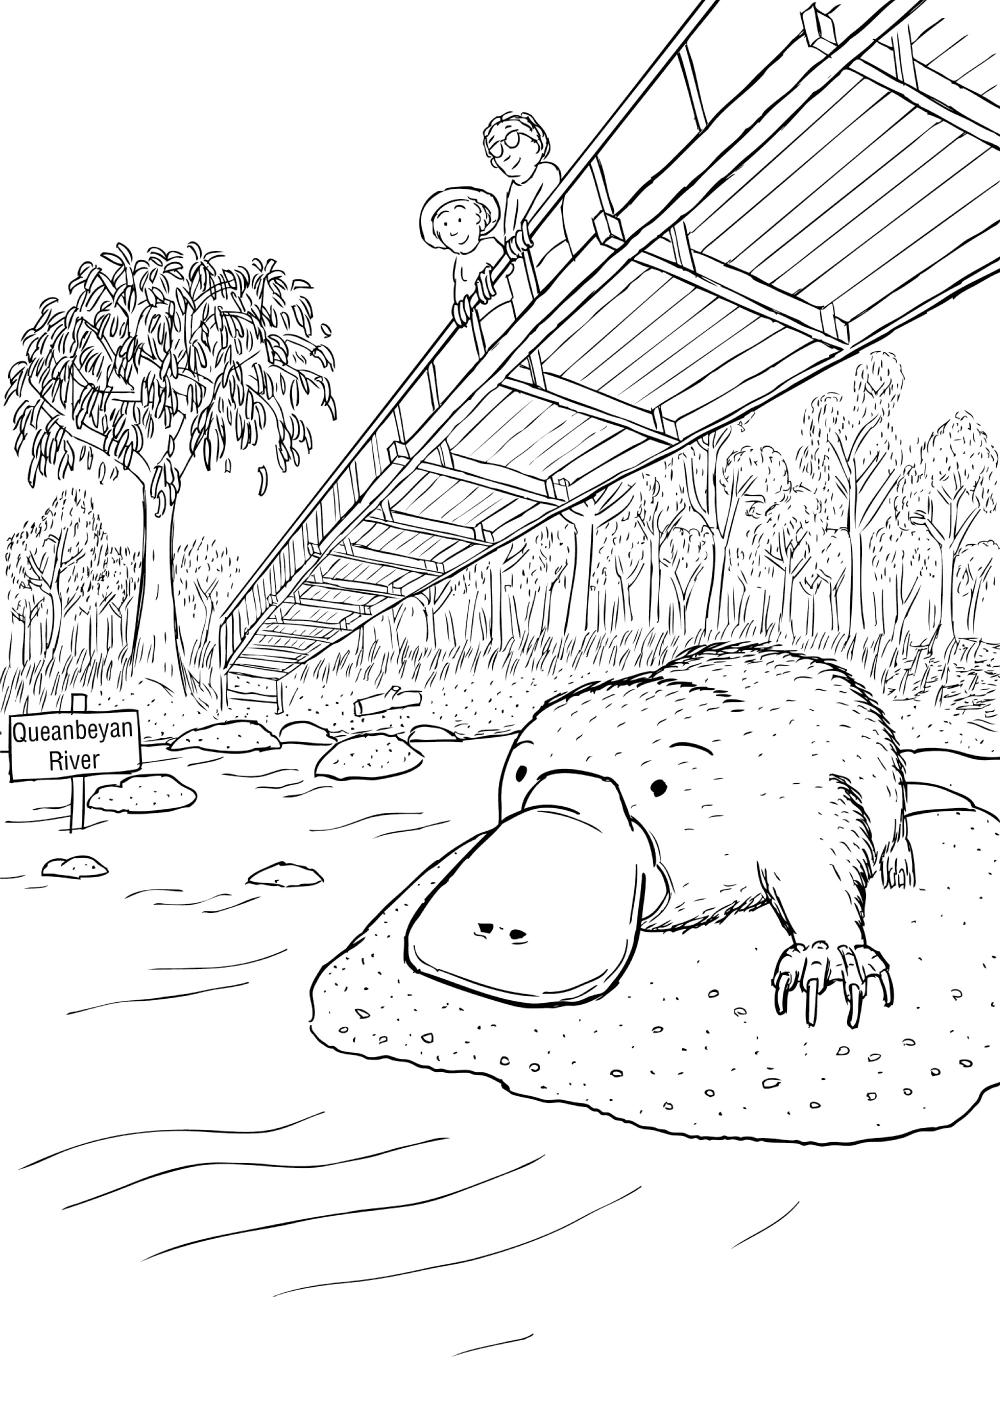 Drawn river cartoon On bridge man river's woman